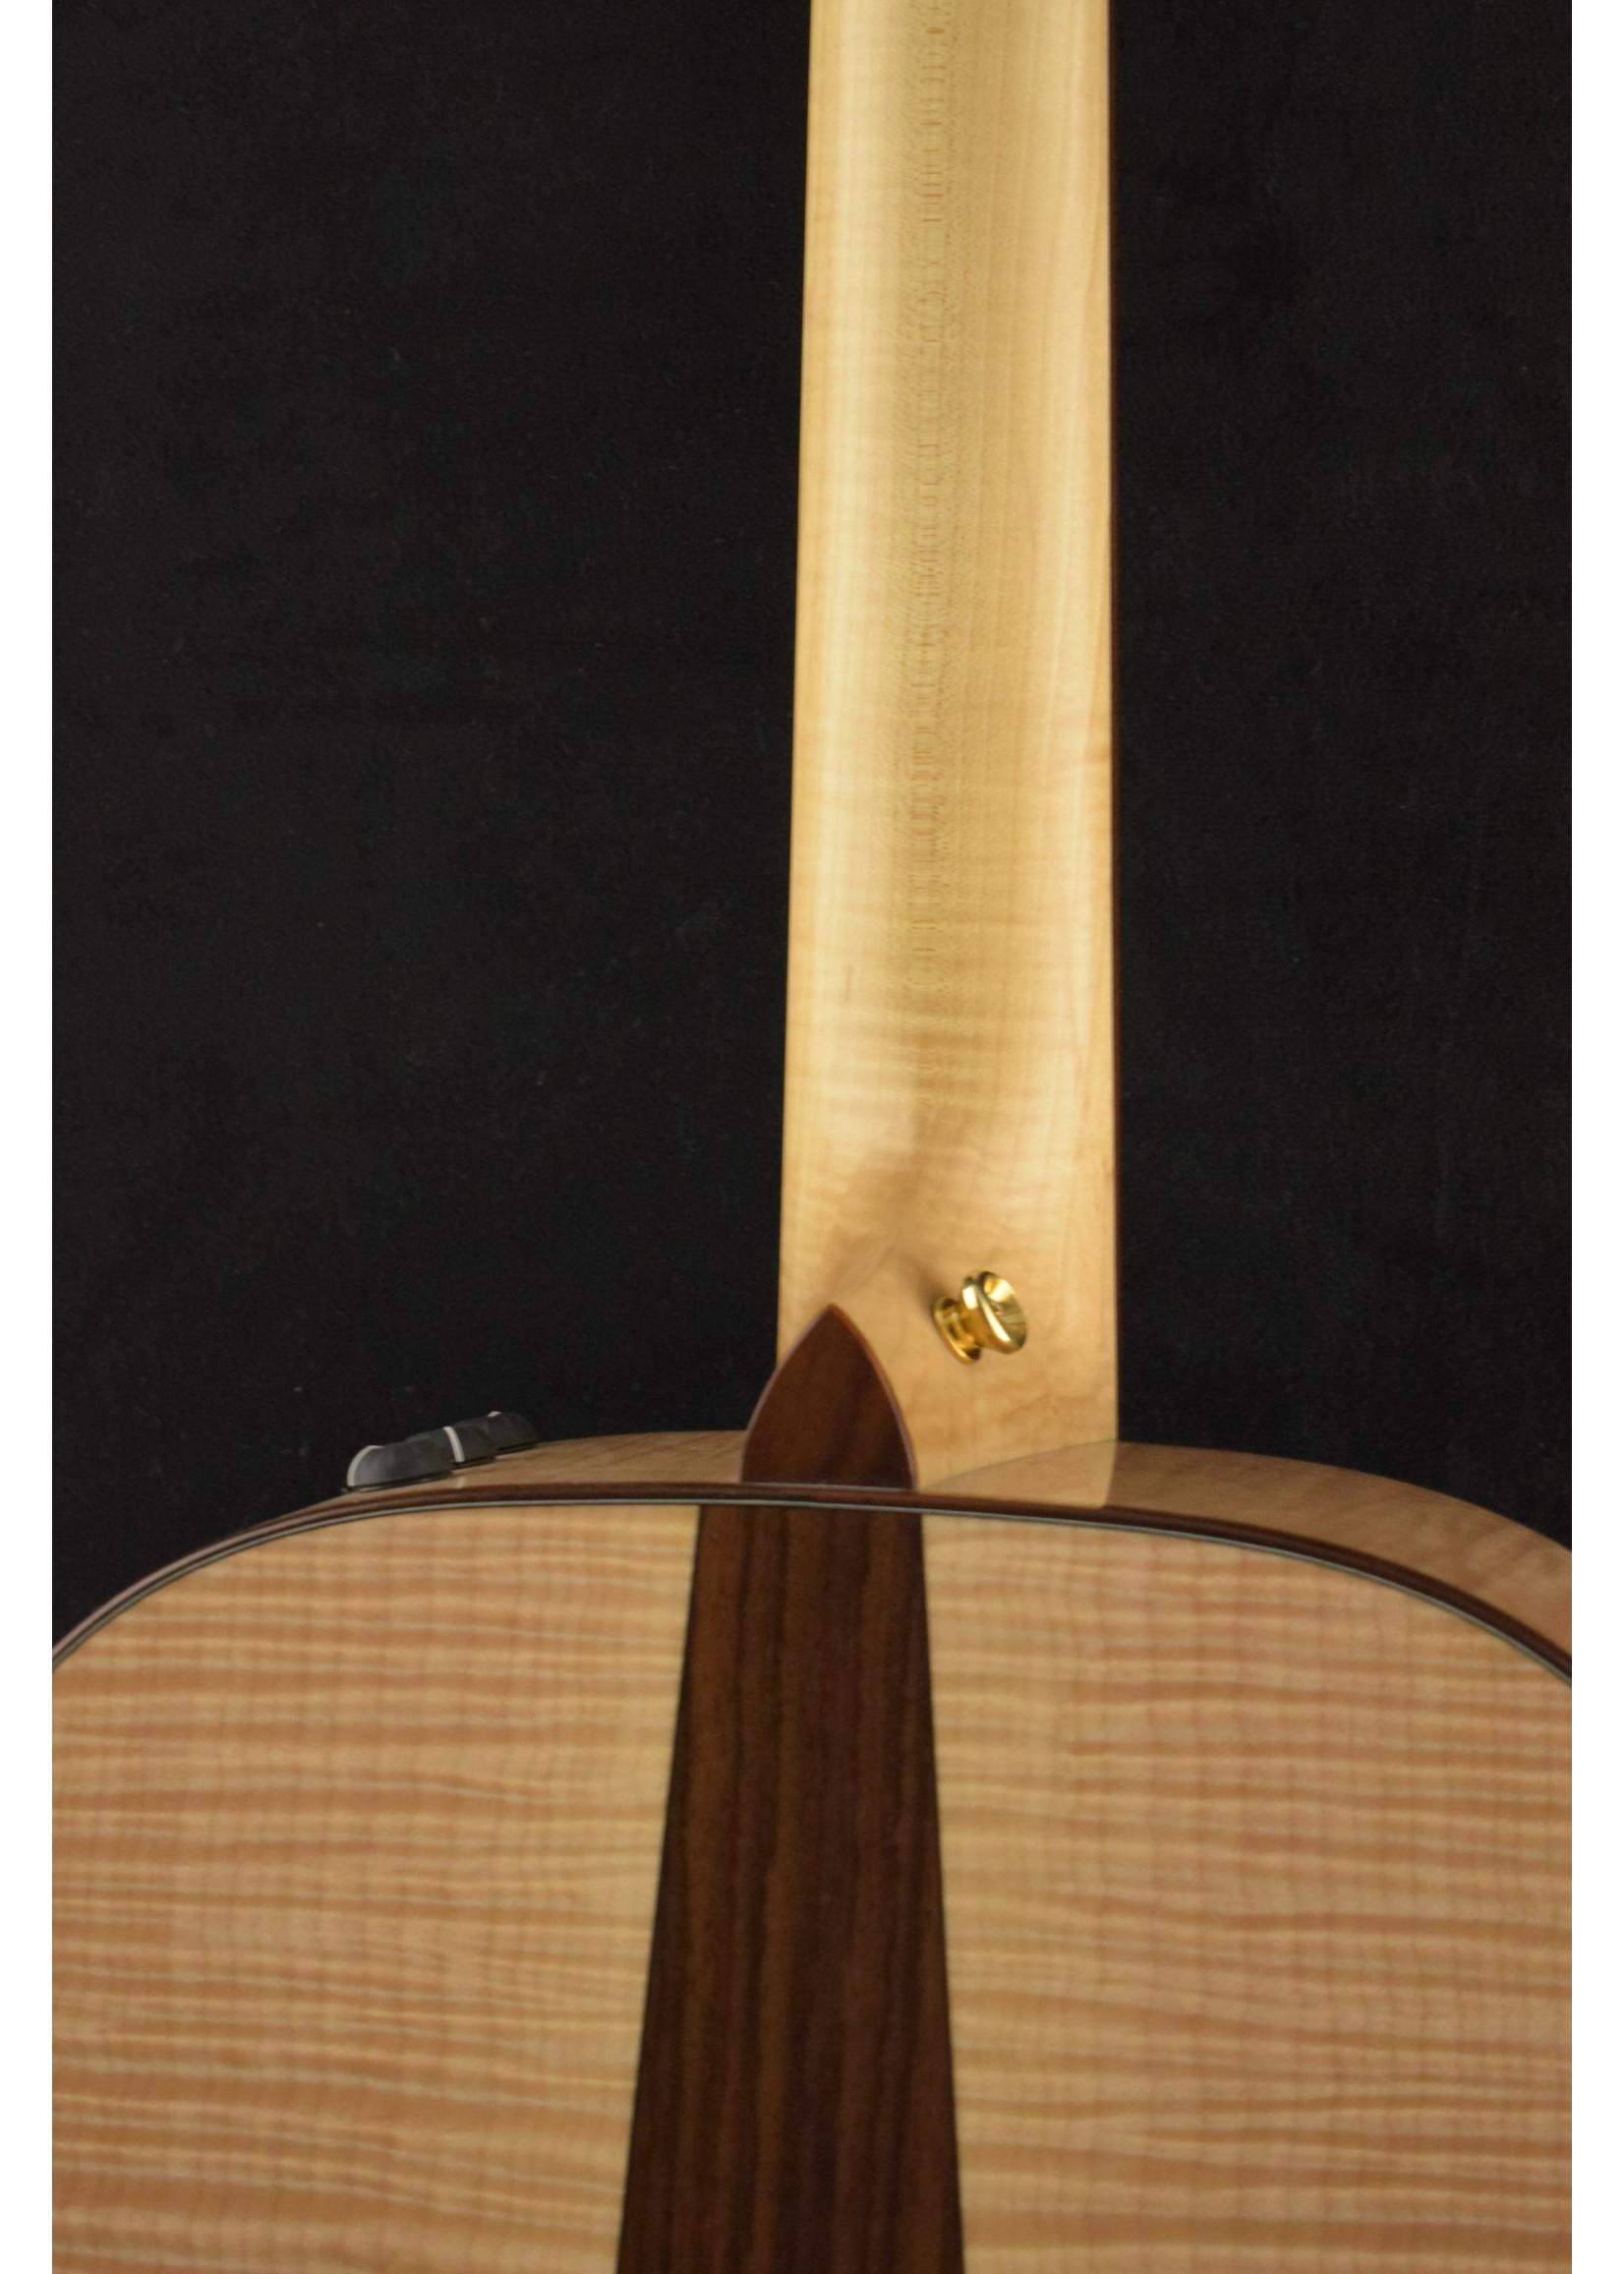 Taylor Taylor BTO# 6911 Left Handed Flame Maple/Cedar w/Full Factory Warranty